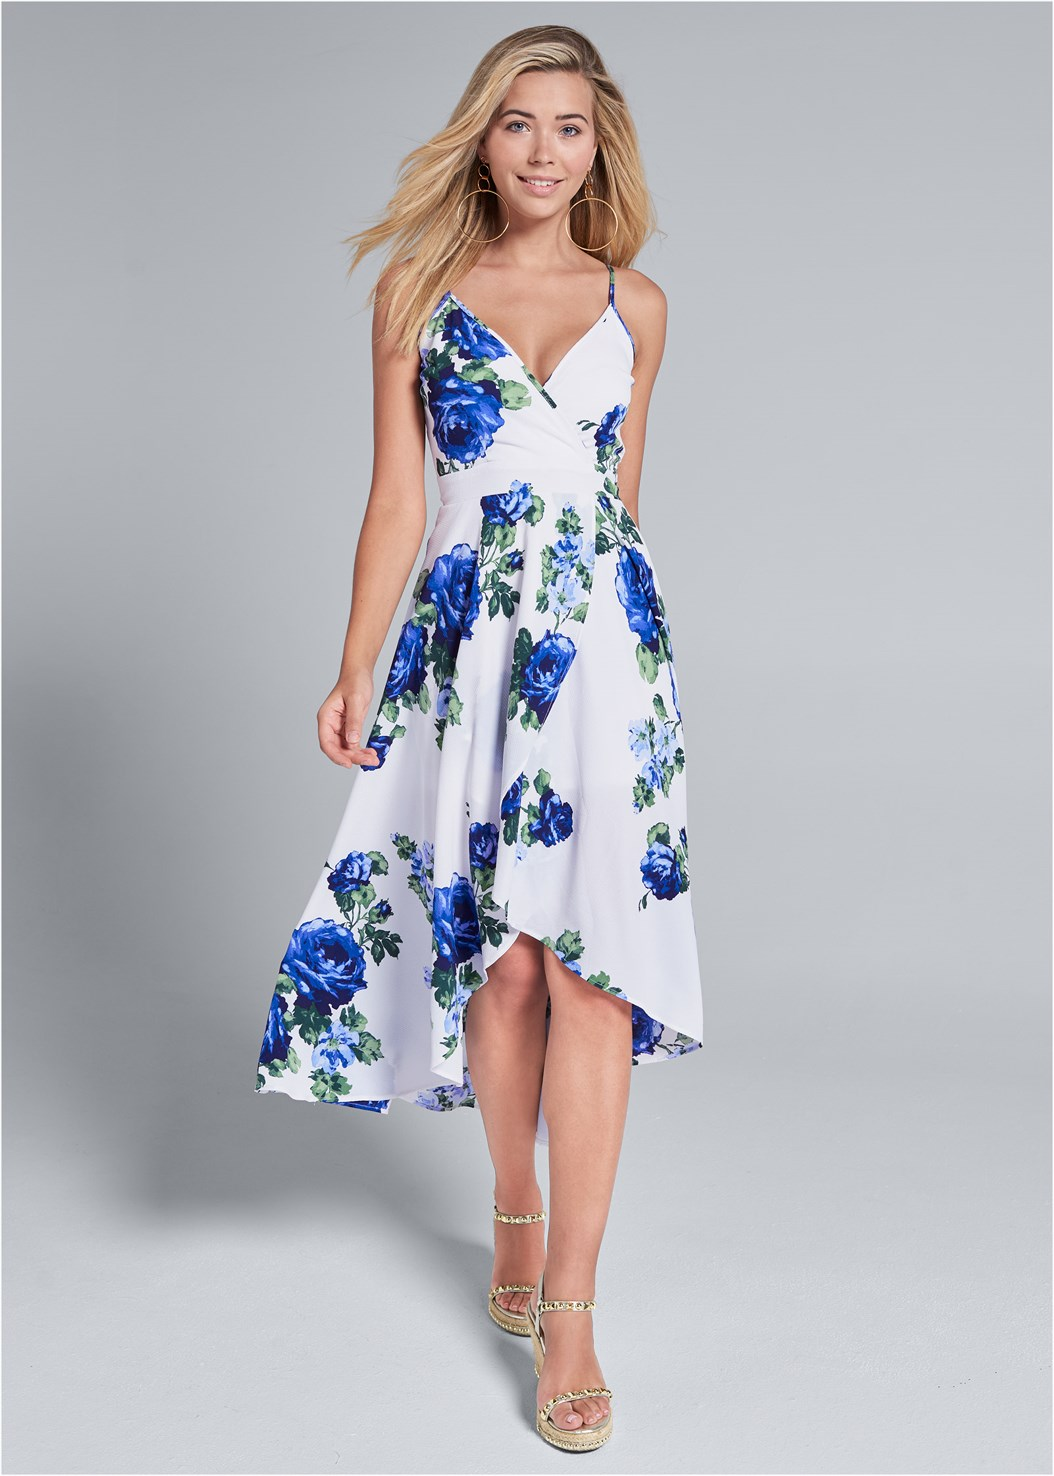 High Low Floral V-Neck Dress,Embellished Wedge,Hoop Earrings